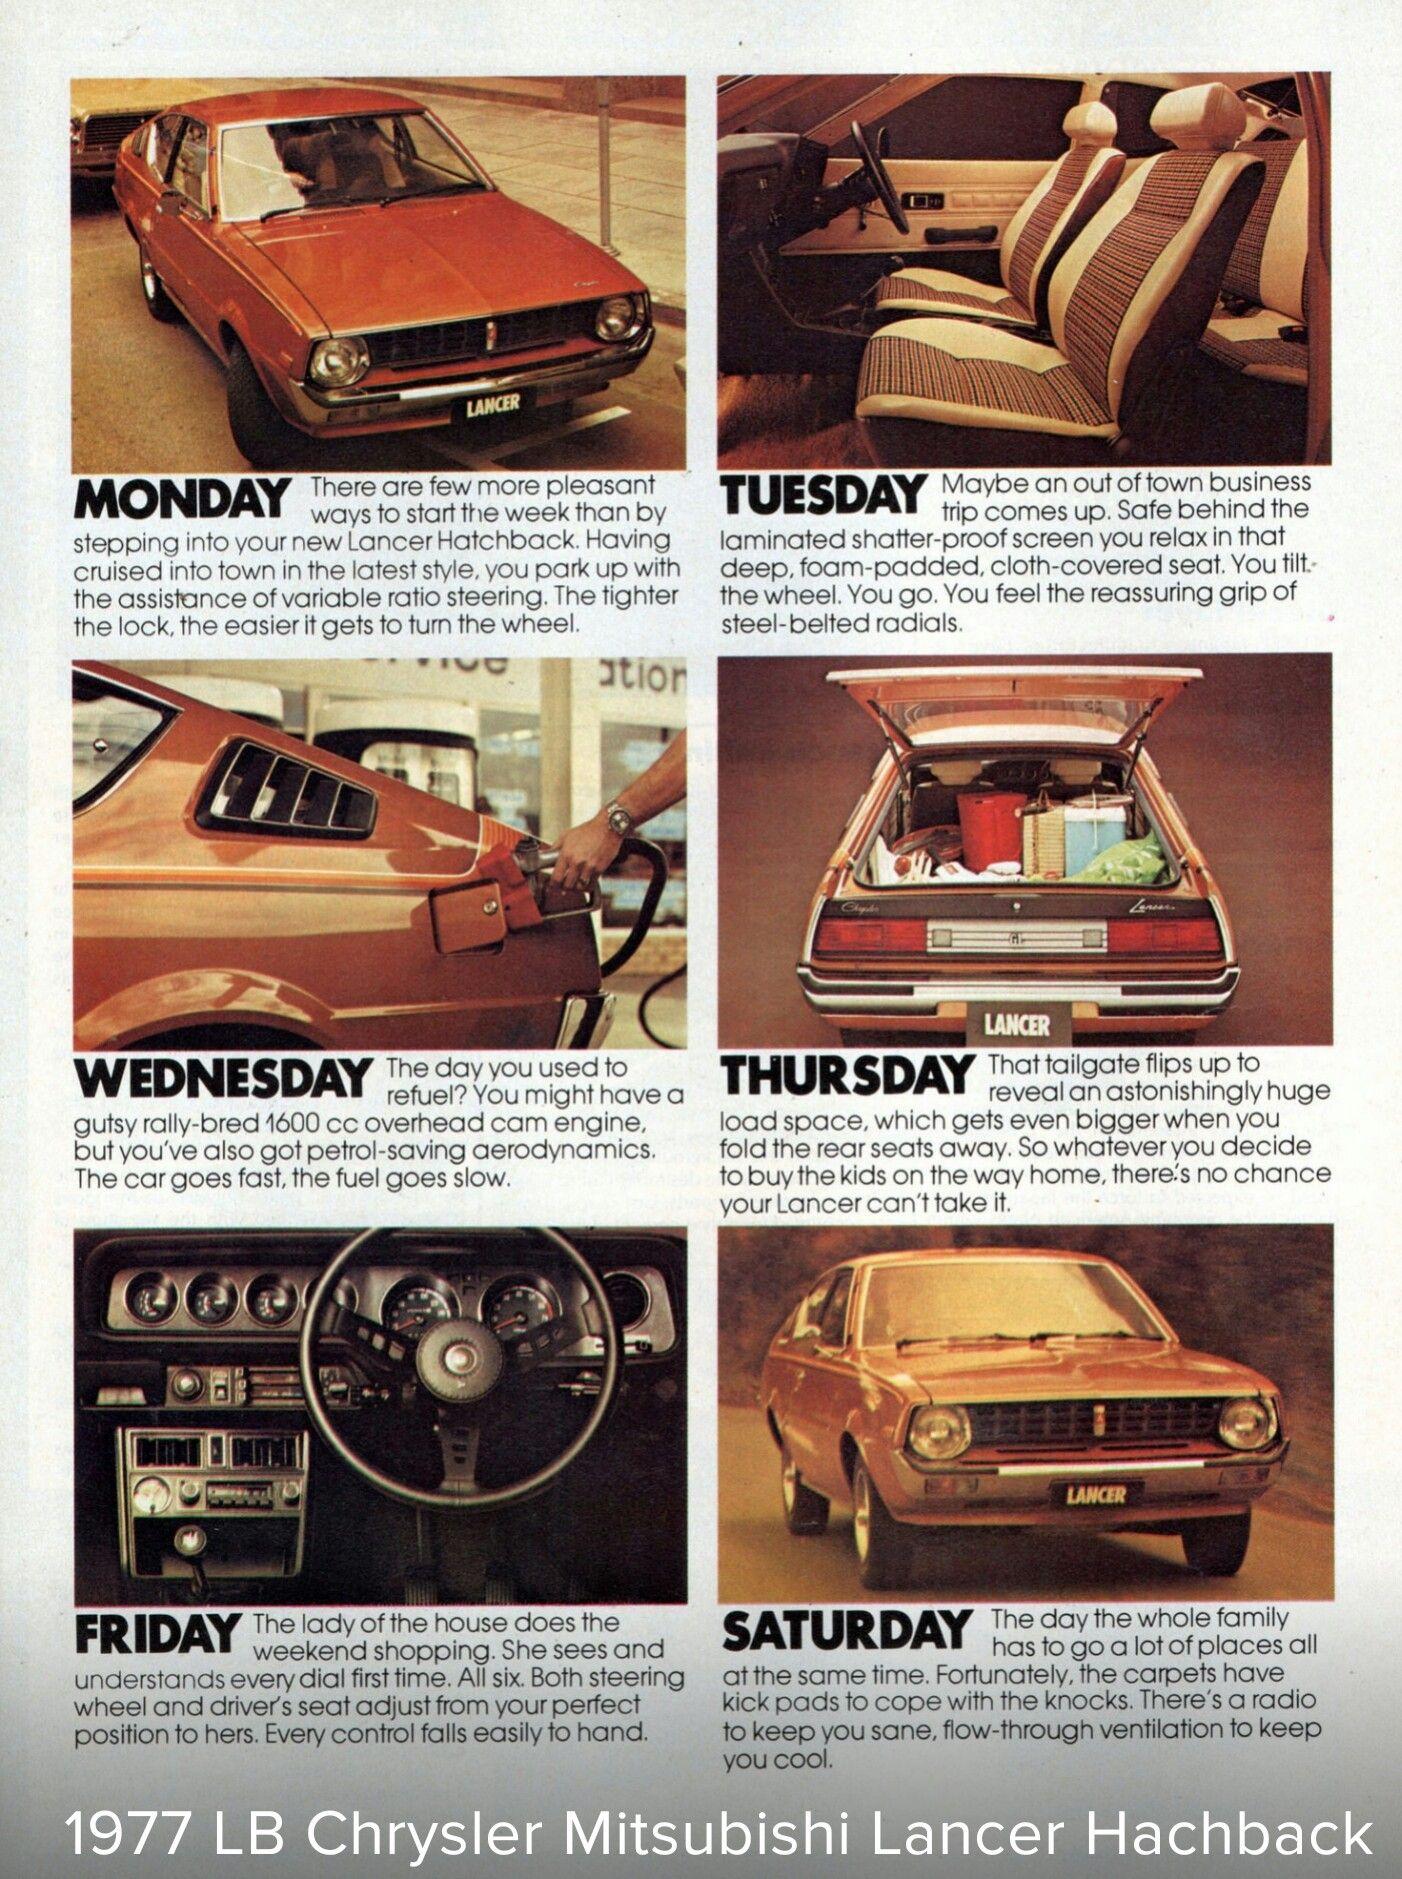 1977 LB Chrysler (Mitsubishi) Lancer Hatchback - Australia, Page ONE ...